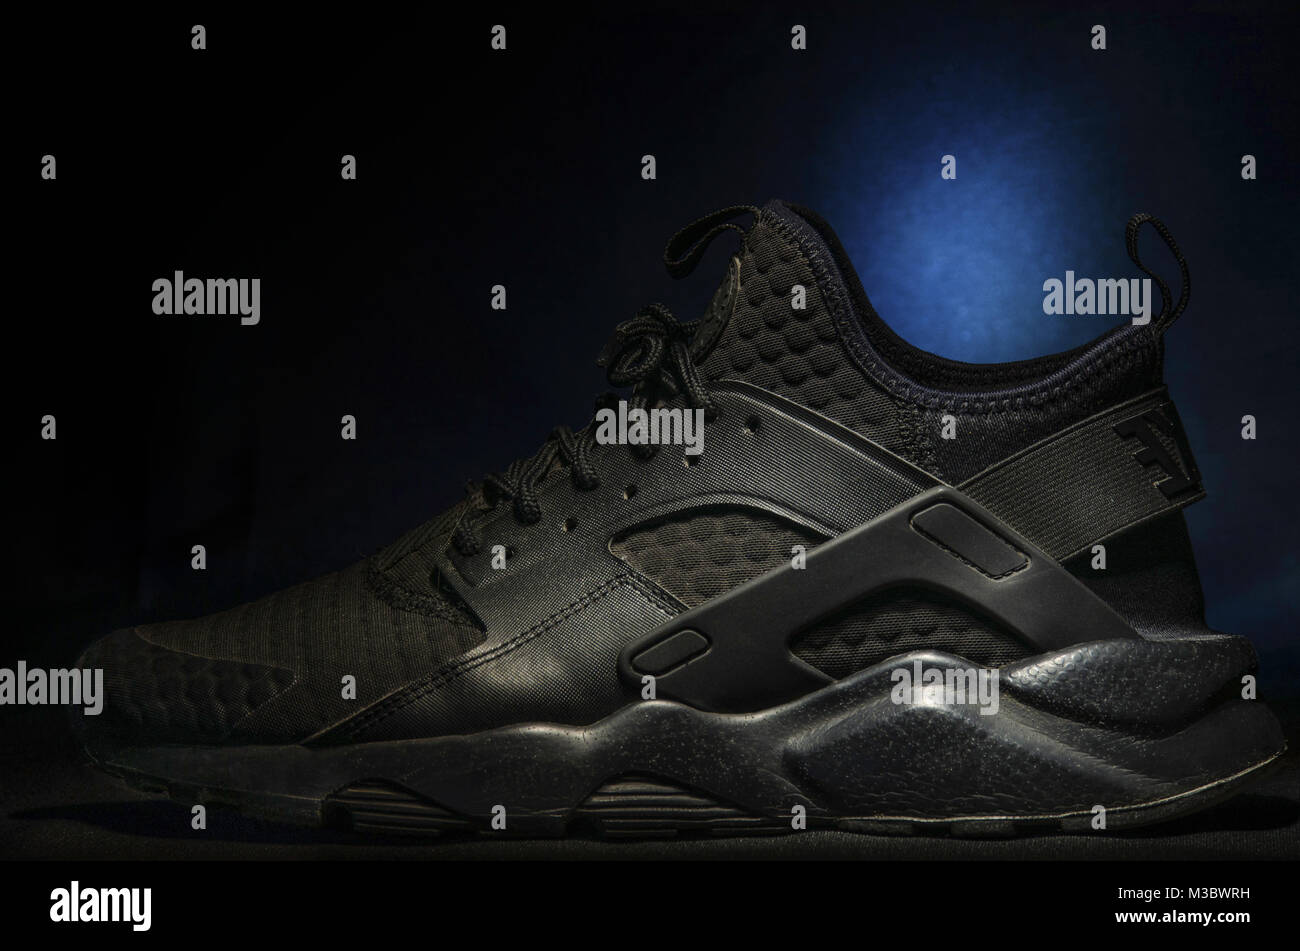 4c80853d1baa Nike Huarache youth baseball cleats - USA. PNN05J (RM). Nike Air Huarache  Ultra SE Premium Triple Black - Stock Image